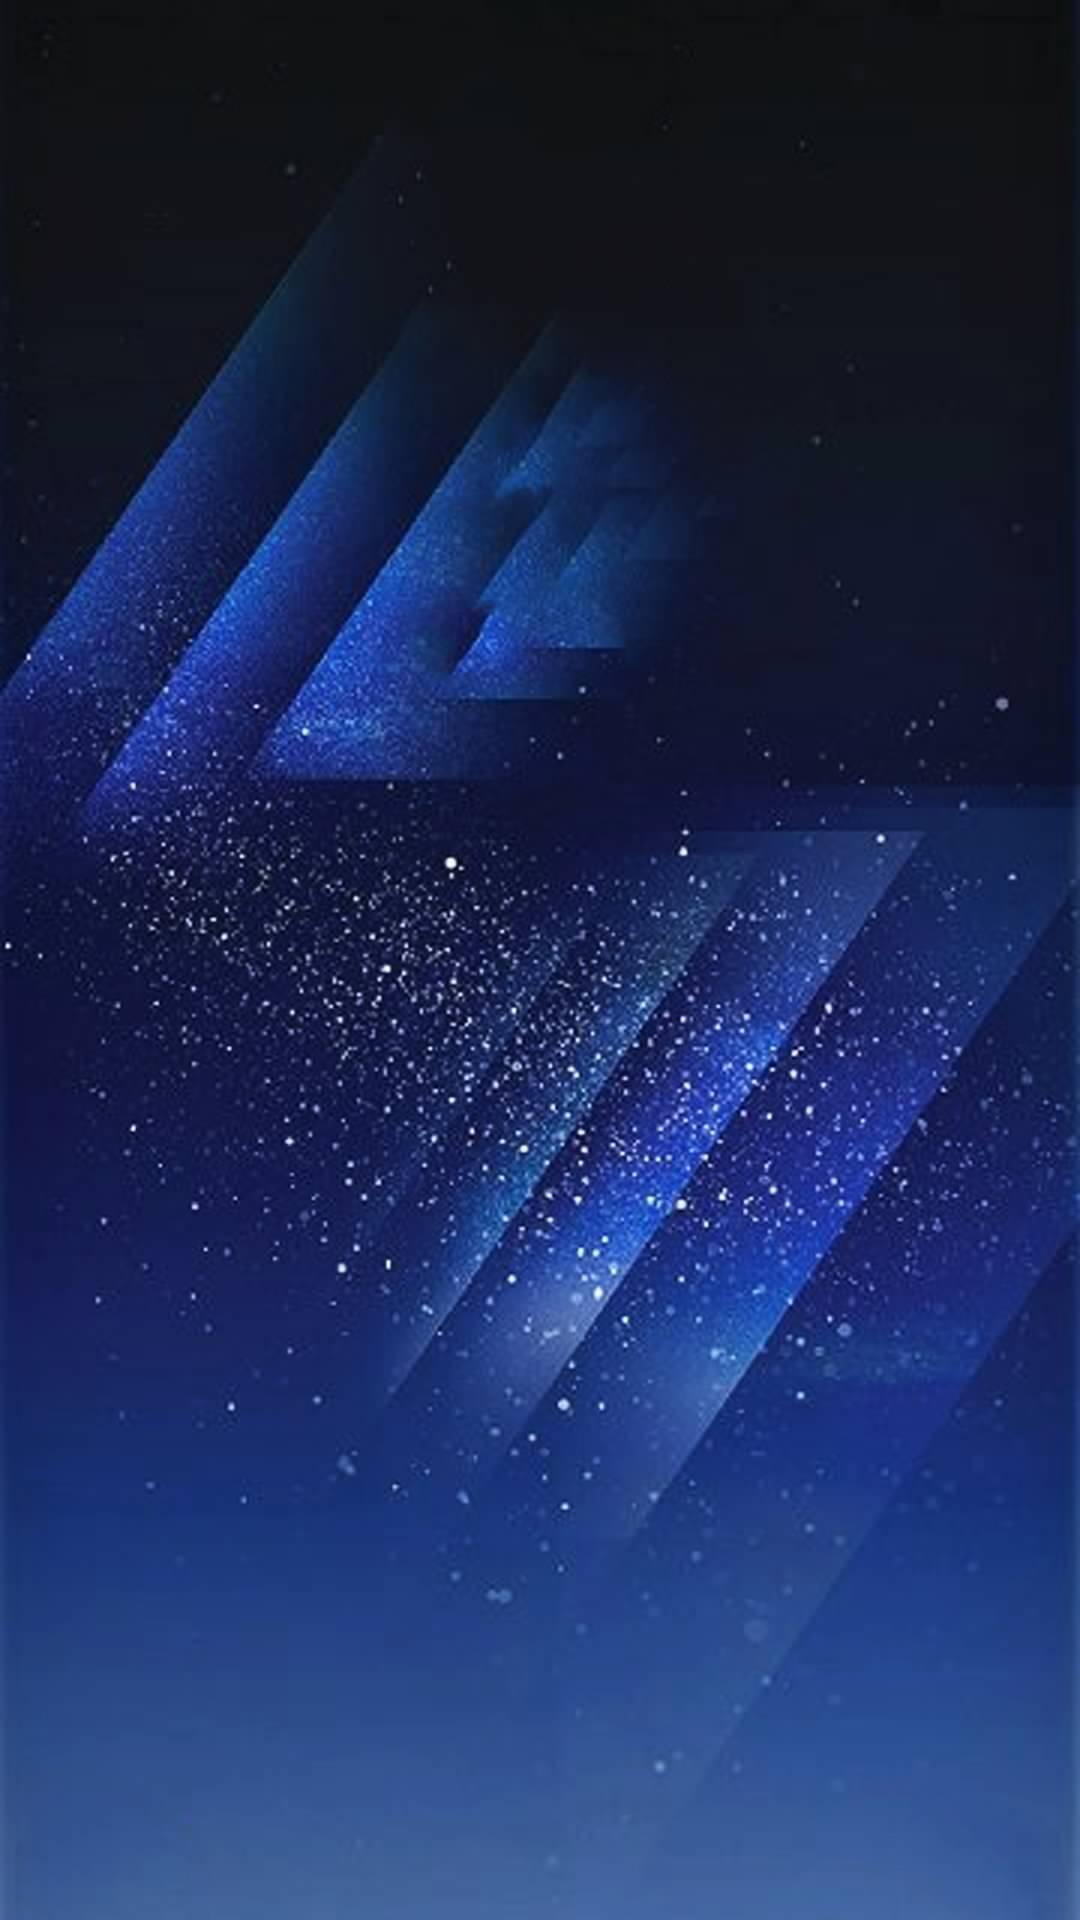 50 Wallpaper S8 Samsung Lockscreenn On Wallpapersafari